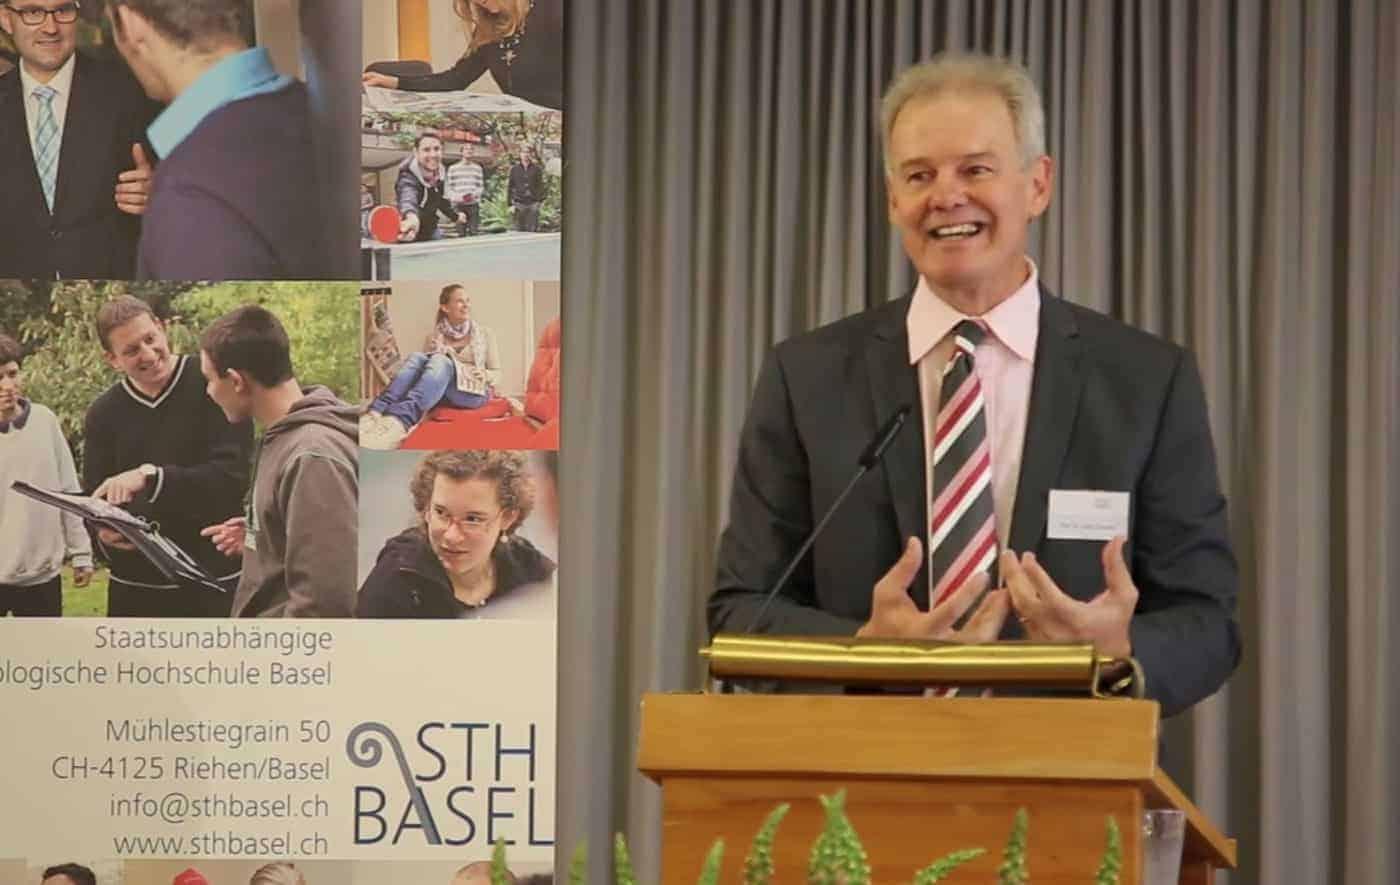 Sth Basel Jacob Thiessen Abschlussfeier 2018